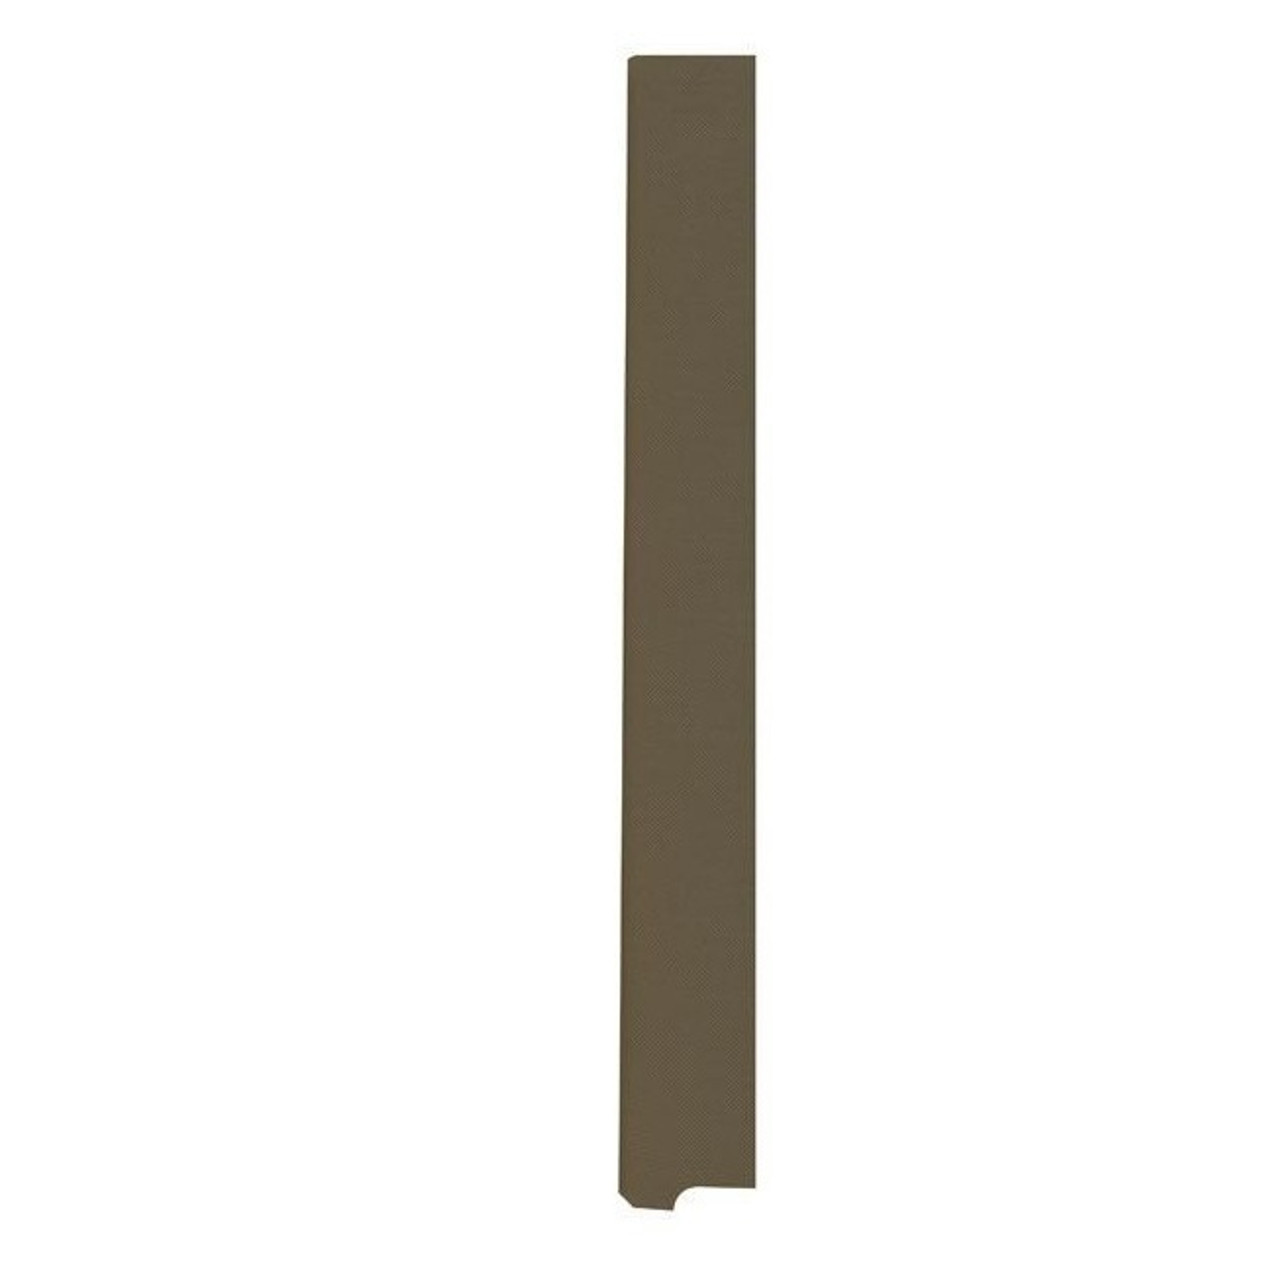 4760 Fuse Box Diagram Fuse Box Circuit Edmiracleco – John Deere 4755 Fuse Panel Diagram